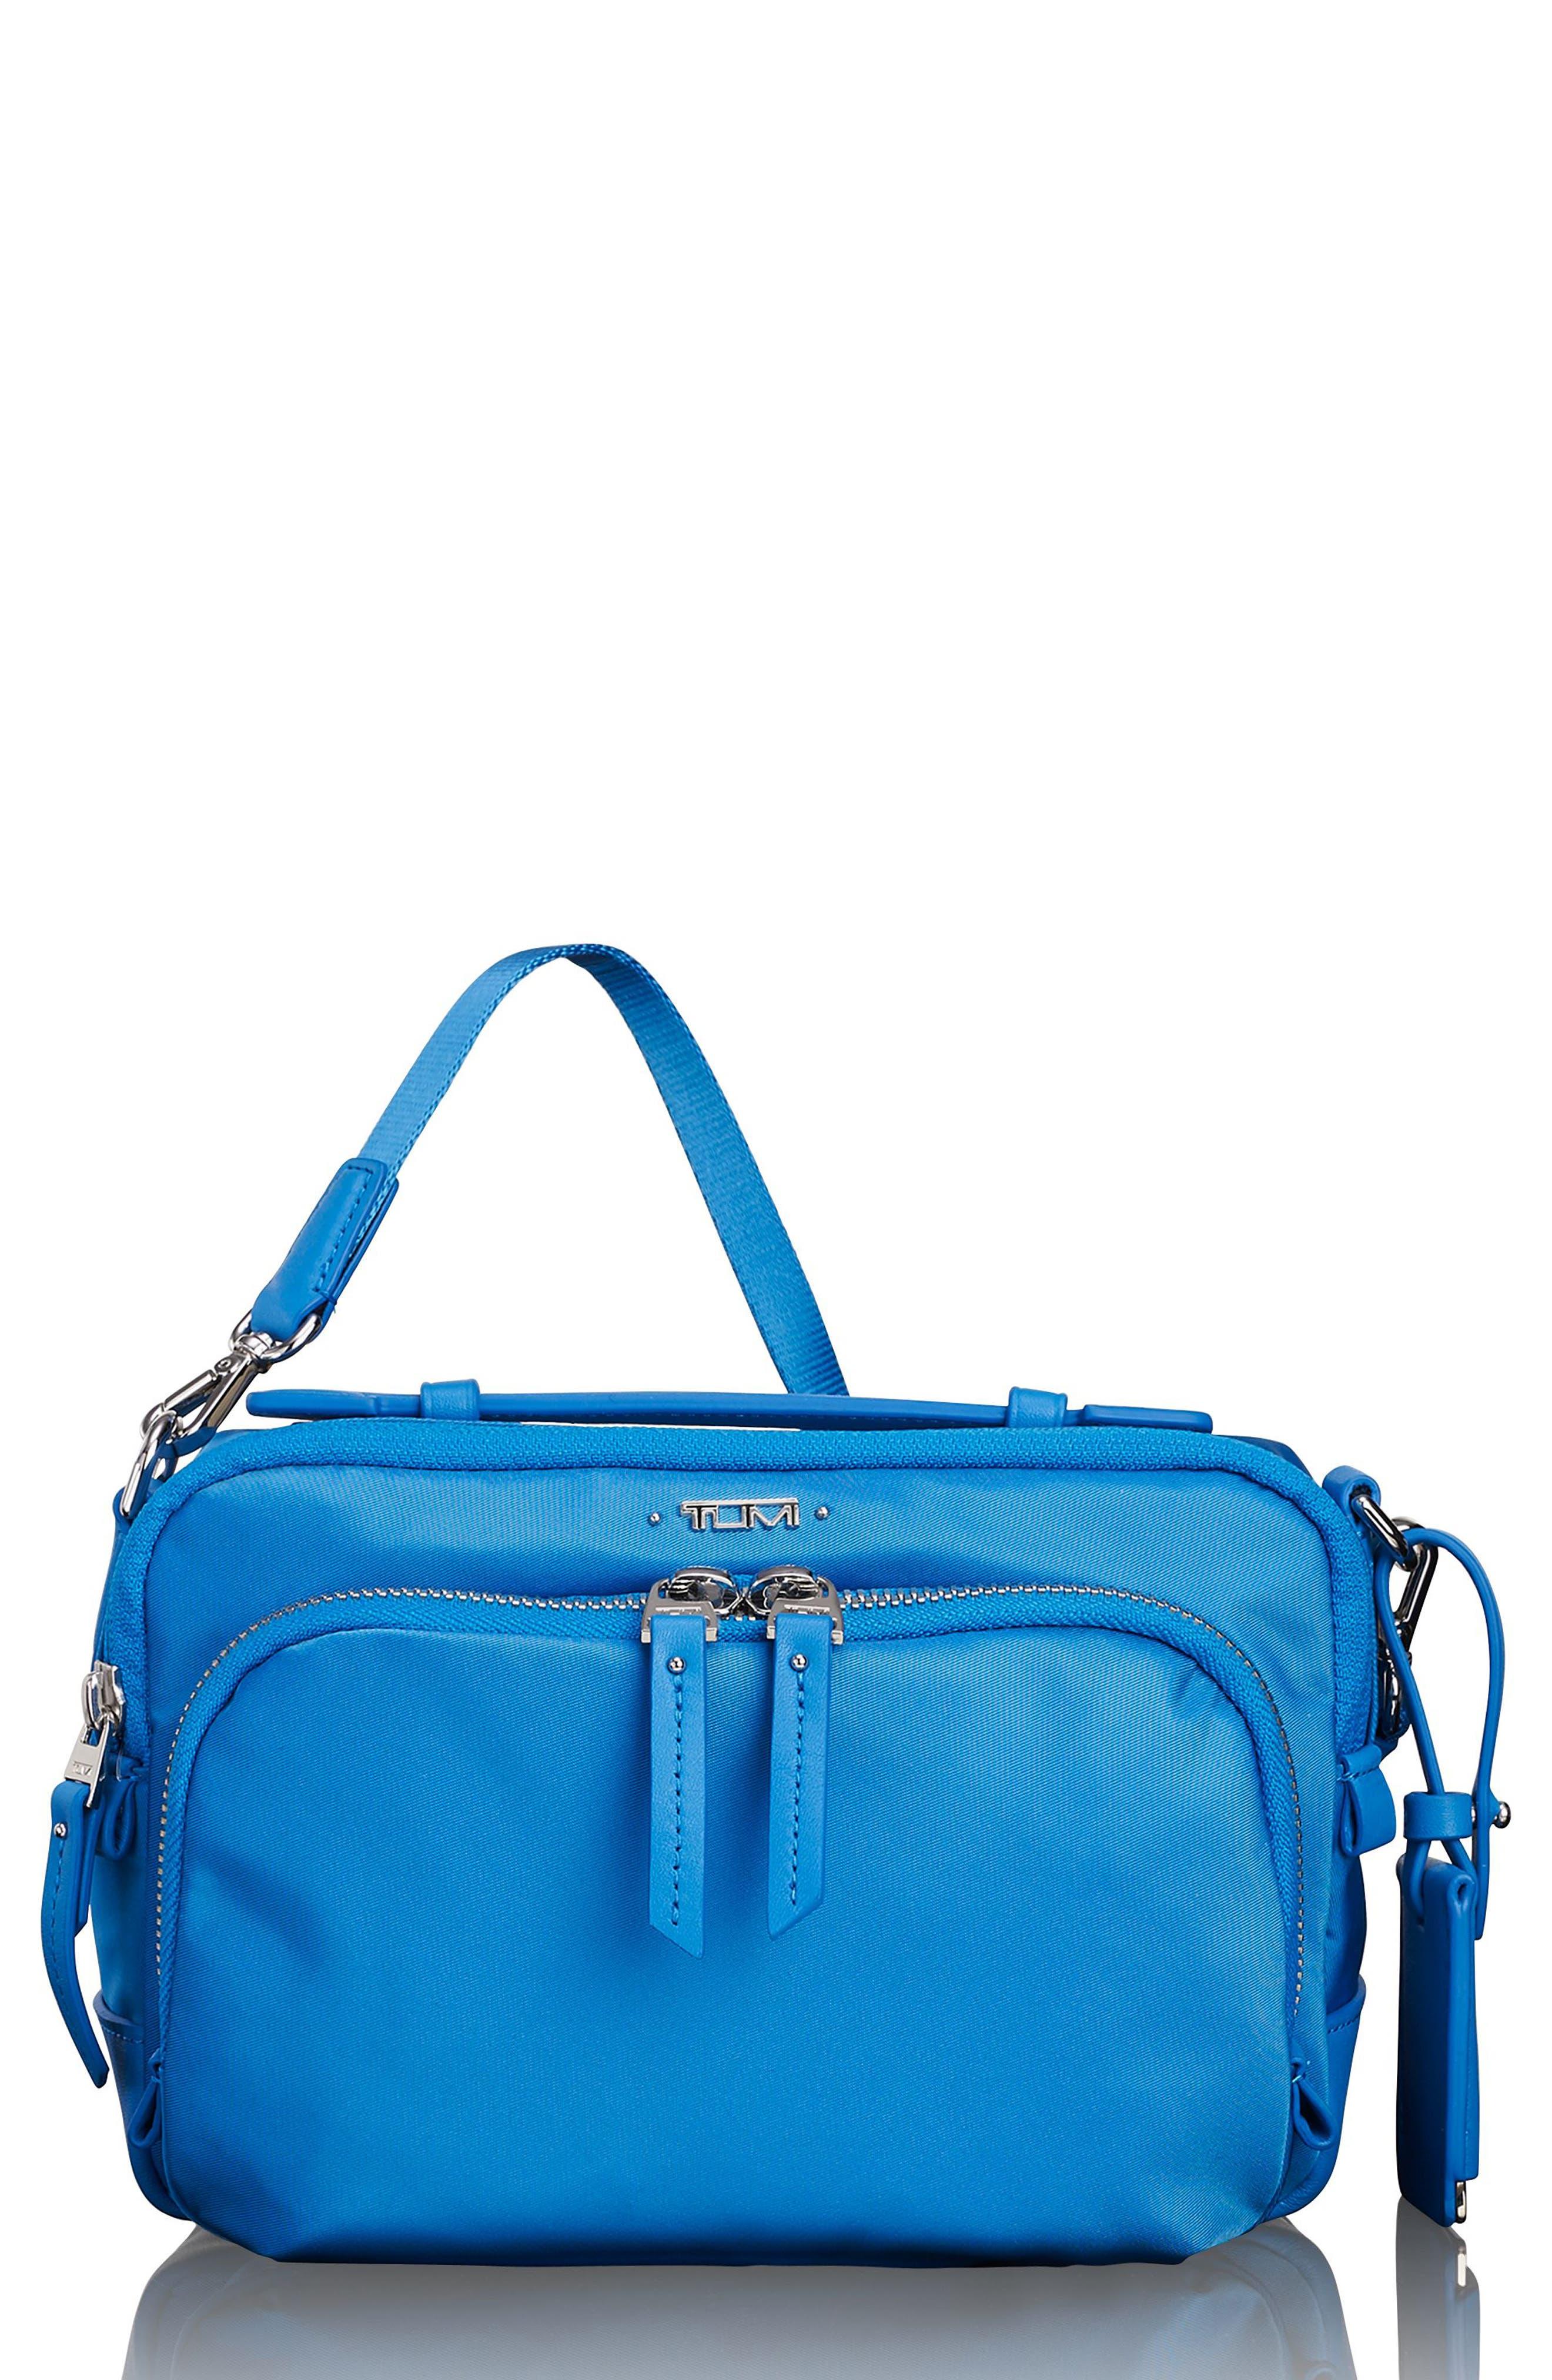 Luanda Crossbody Flight Bag,                         Main,                         color, Bright Blue